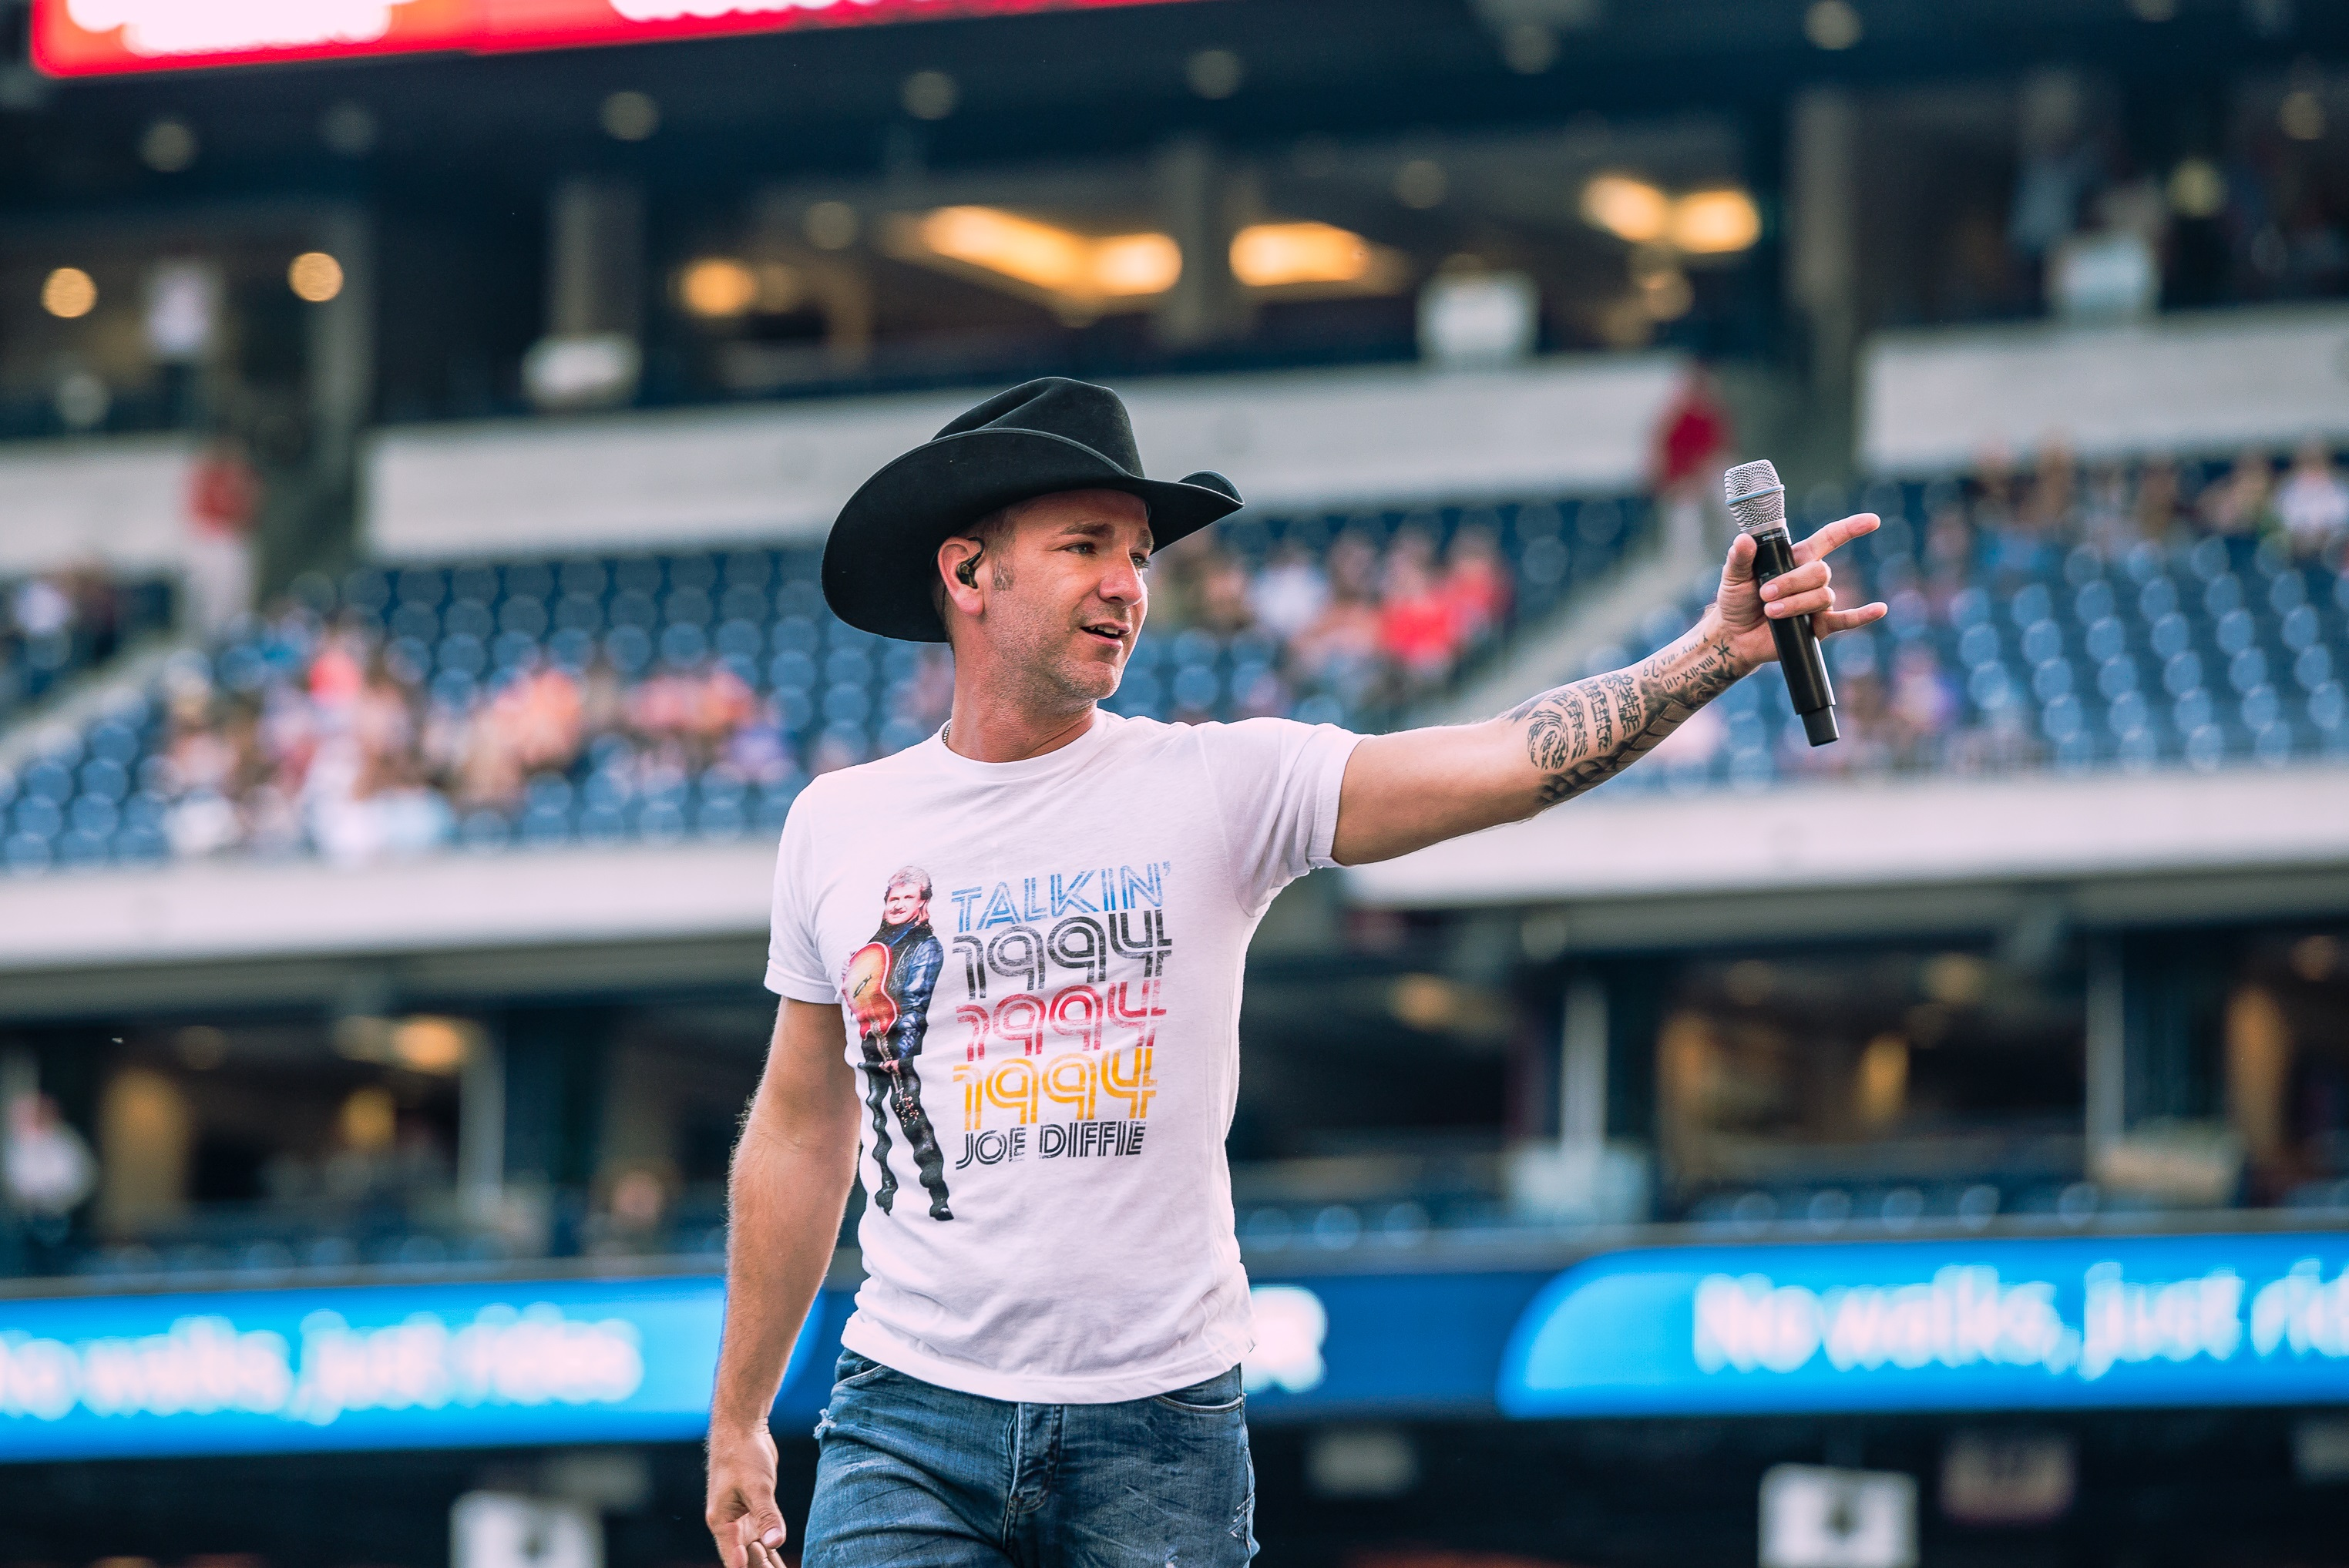 Craig Campbell; Photo credit: Andrew Wendowski/Sounds Like Nashville